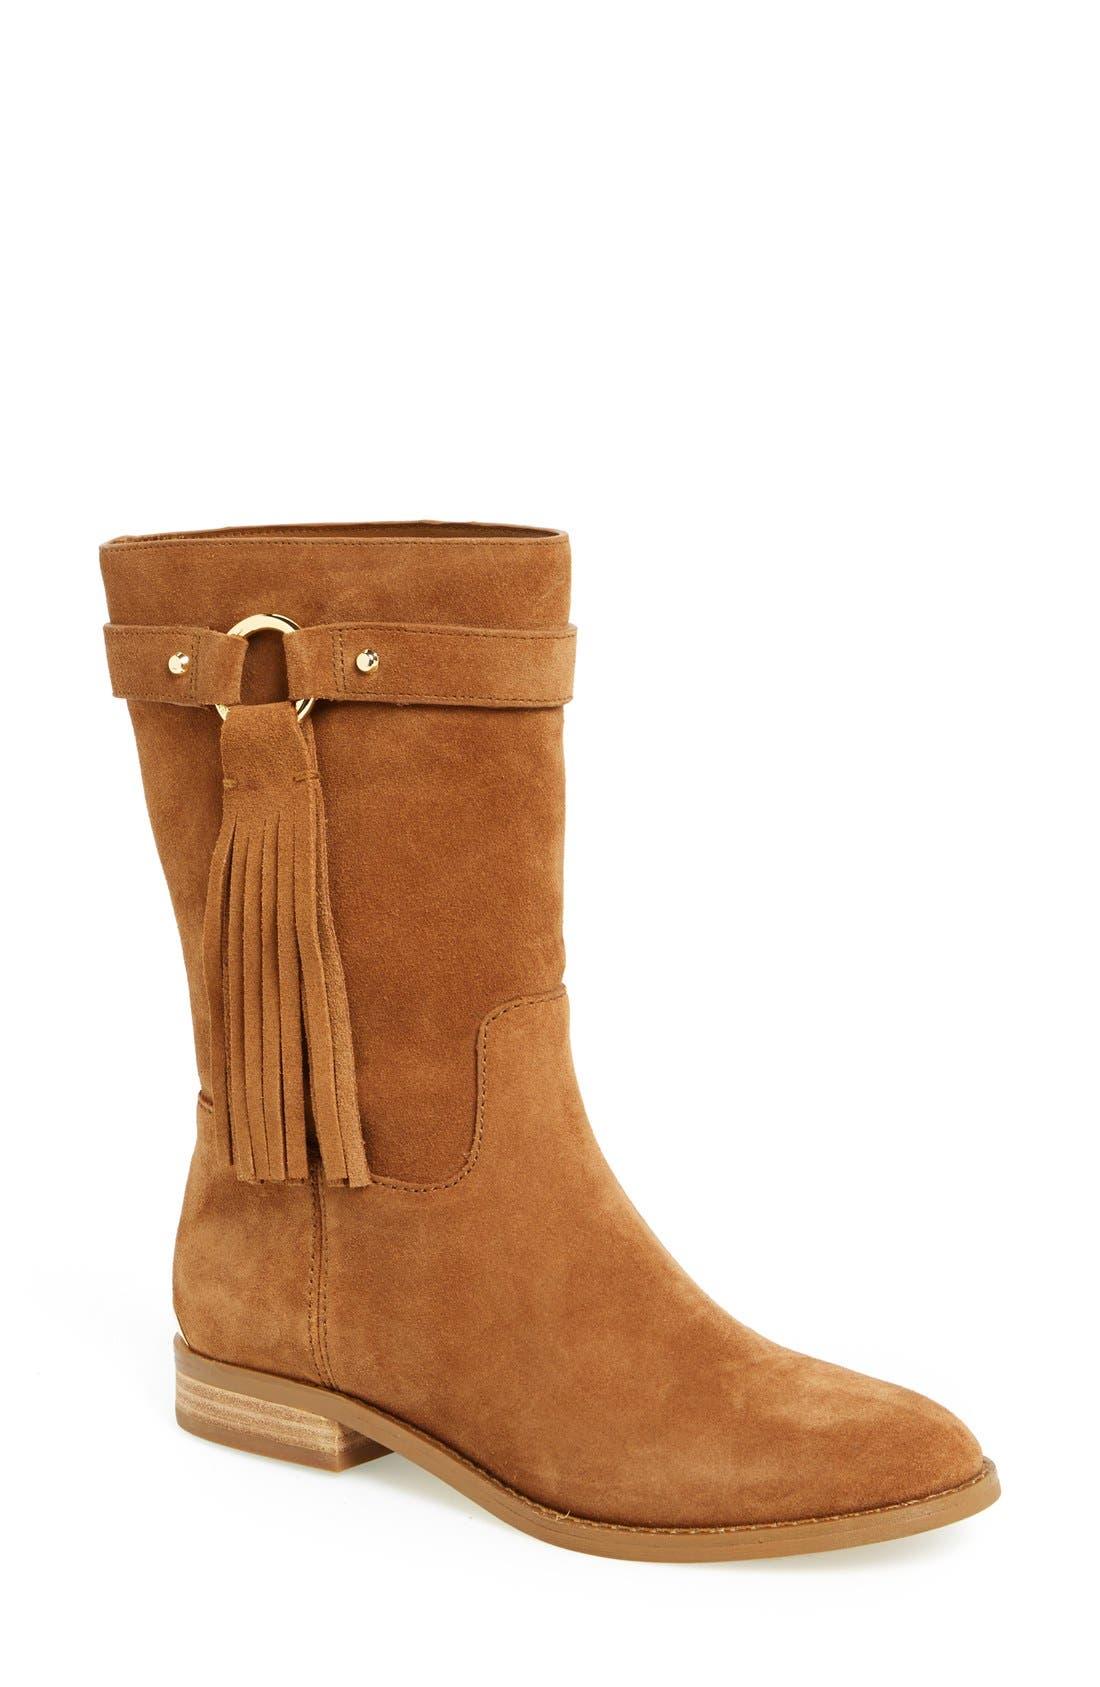 Main Image - MICHAEL Michael Kors 'Rhea' Suede Boot (Women)